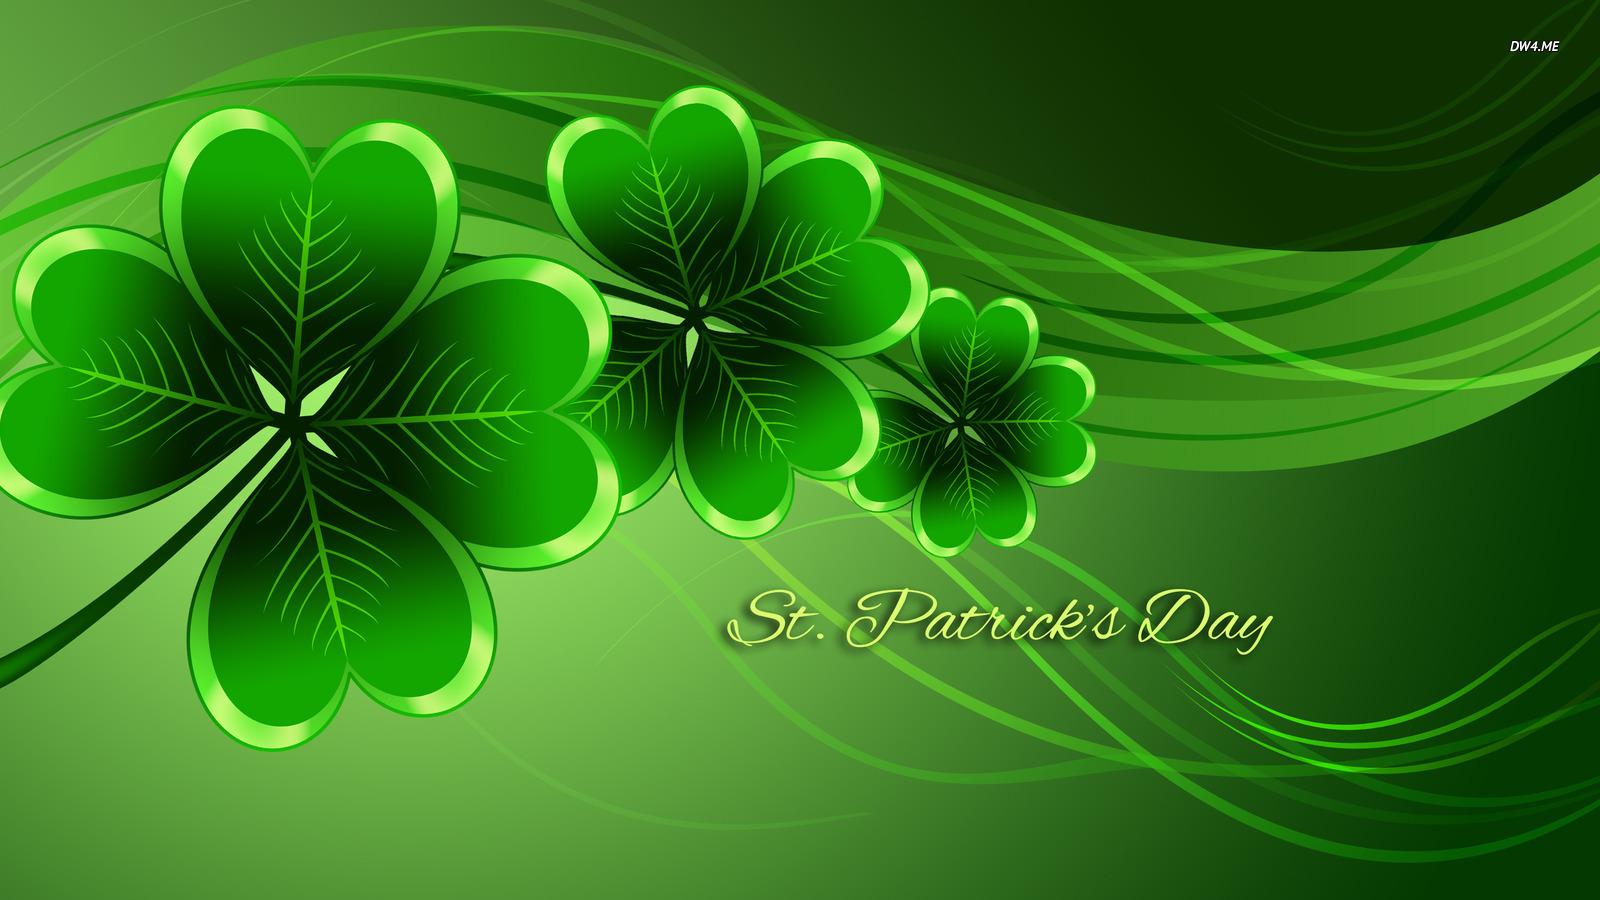 Download Saint Patricks Day wallpaper Holiday wallpapers 2159 1600x900